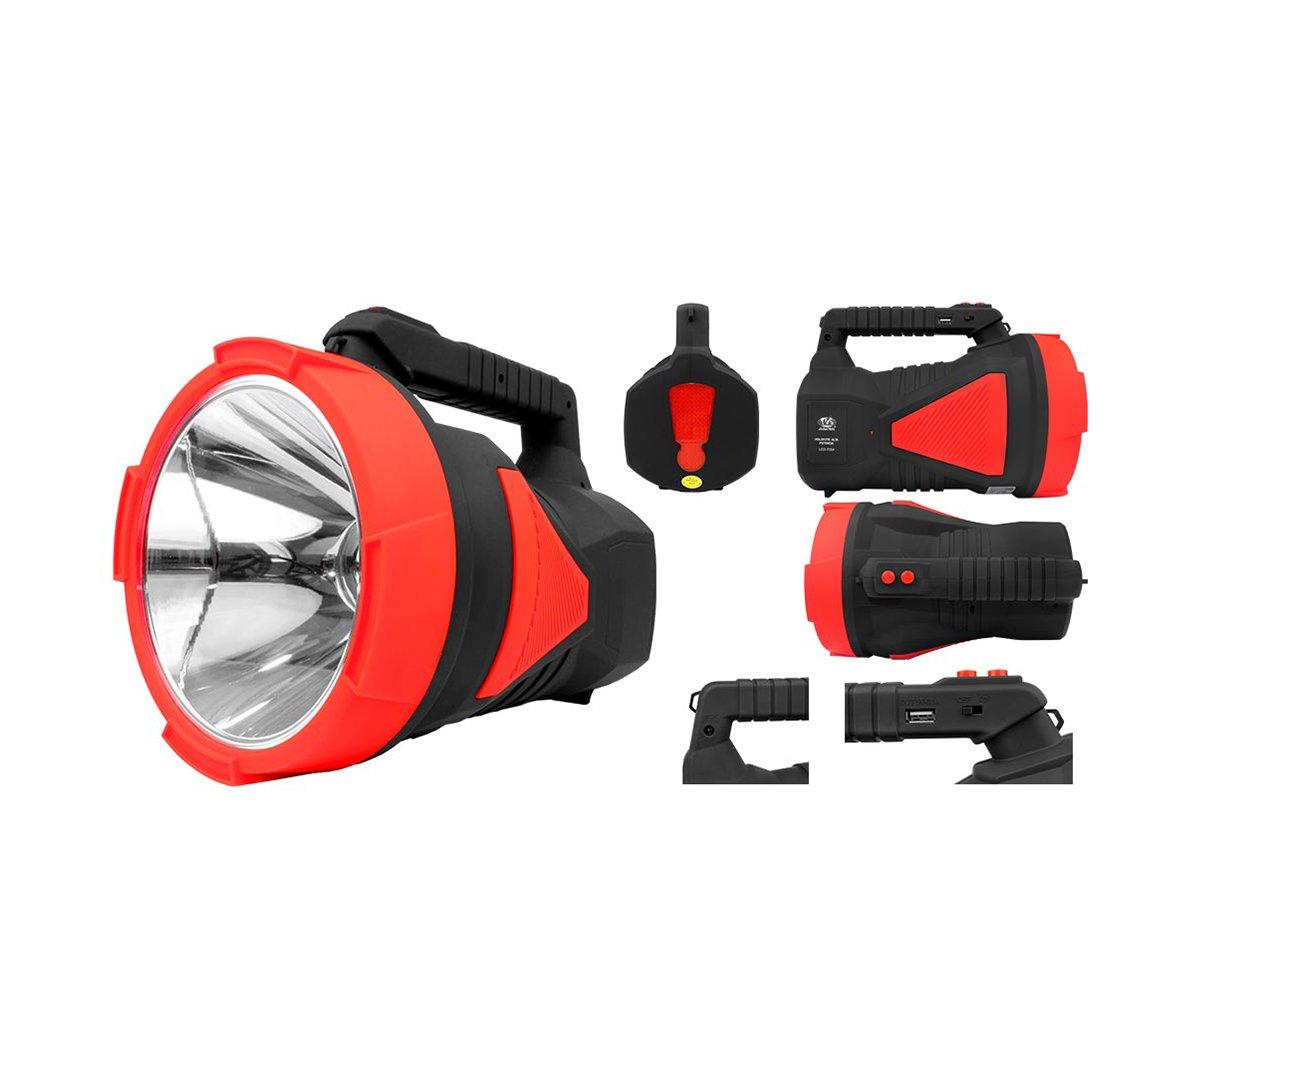 Holofote/lanterna Recarregável 7055 1 Led 10w Alcance 600 Metros - Albatroz